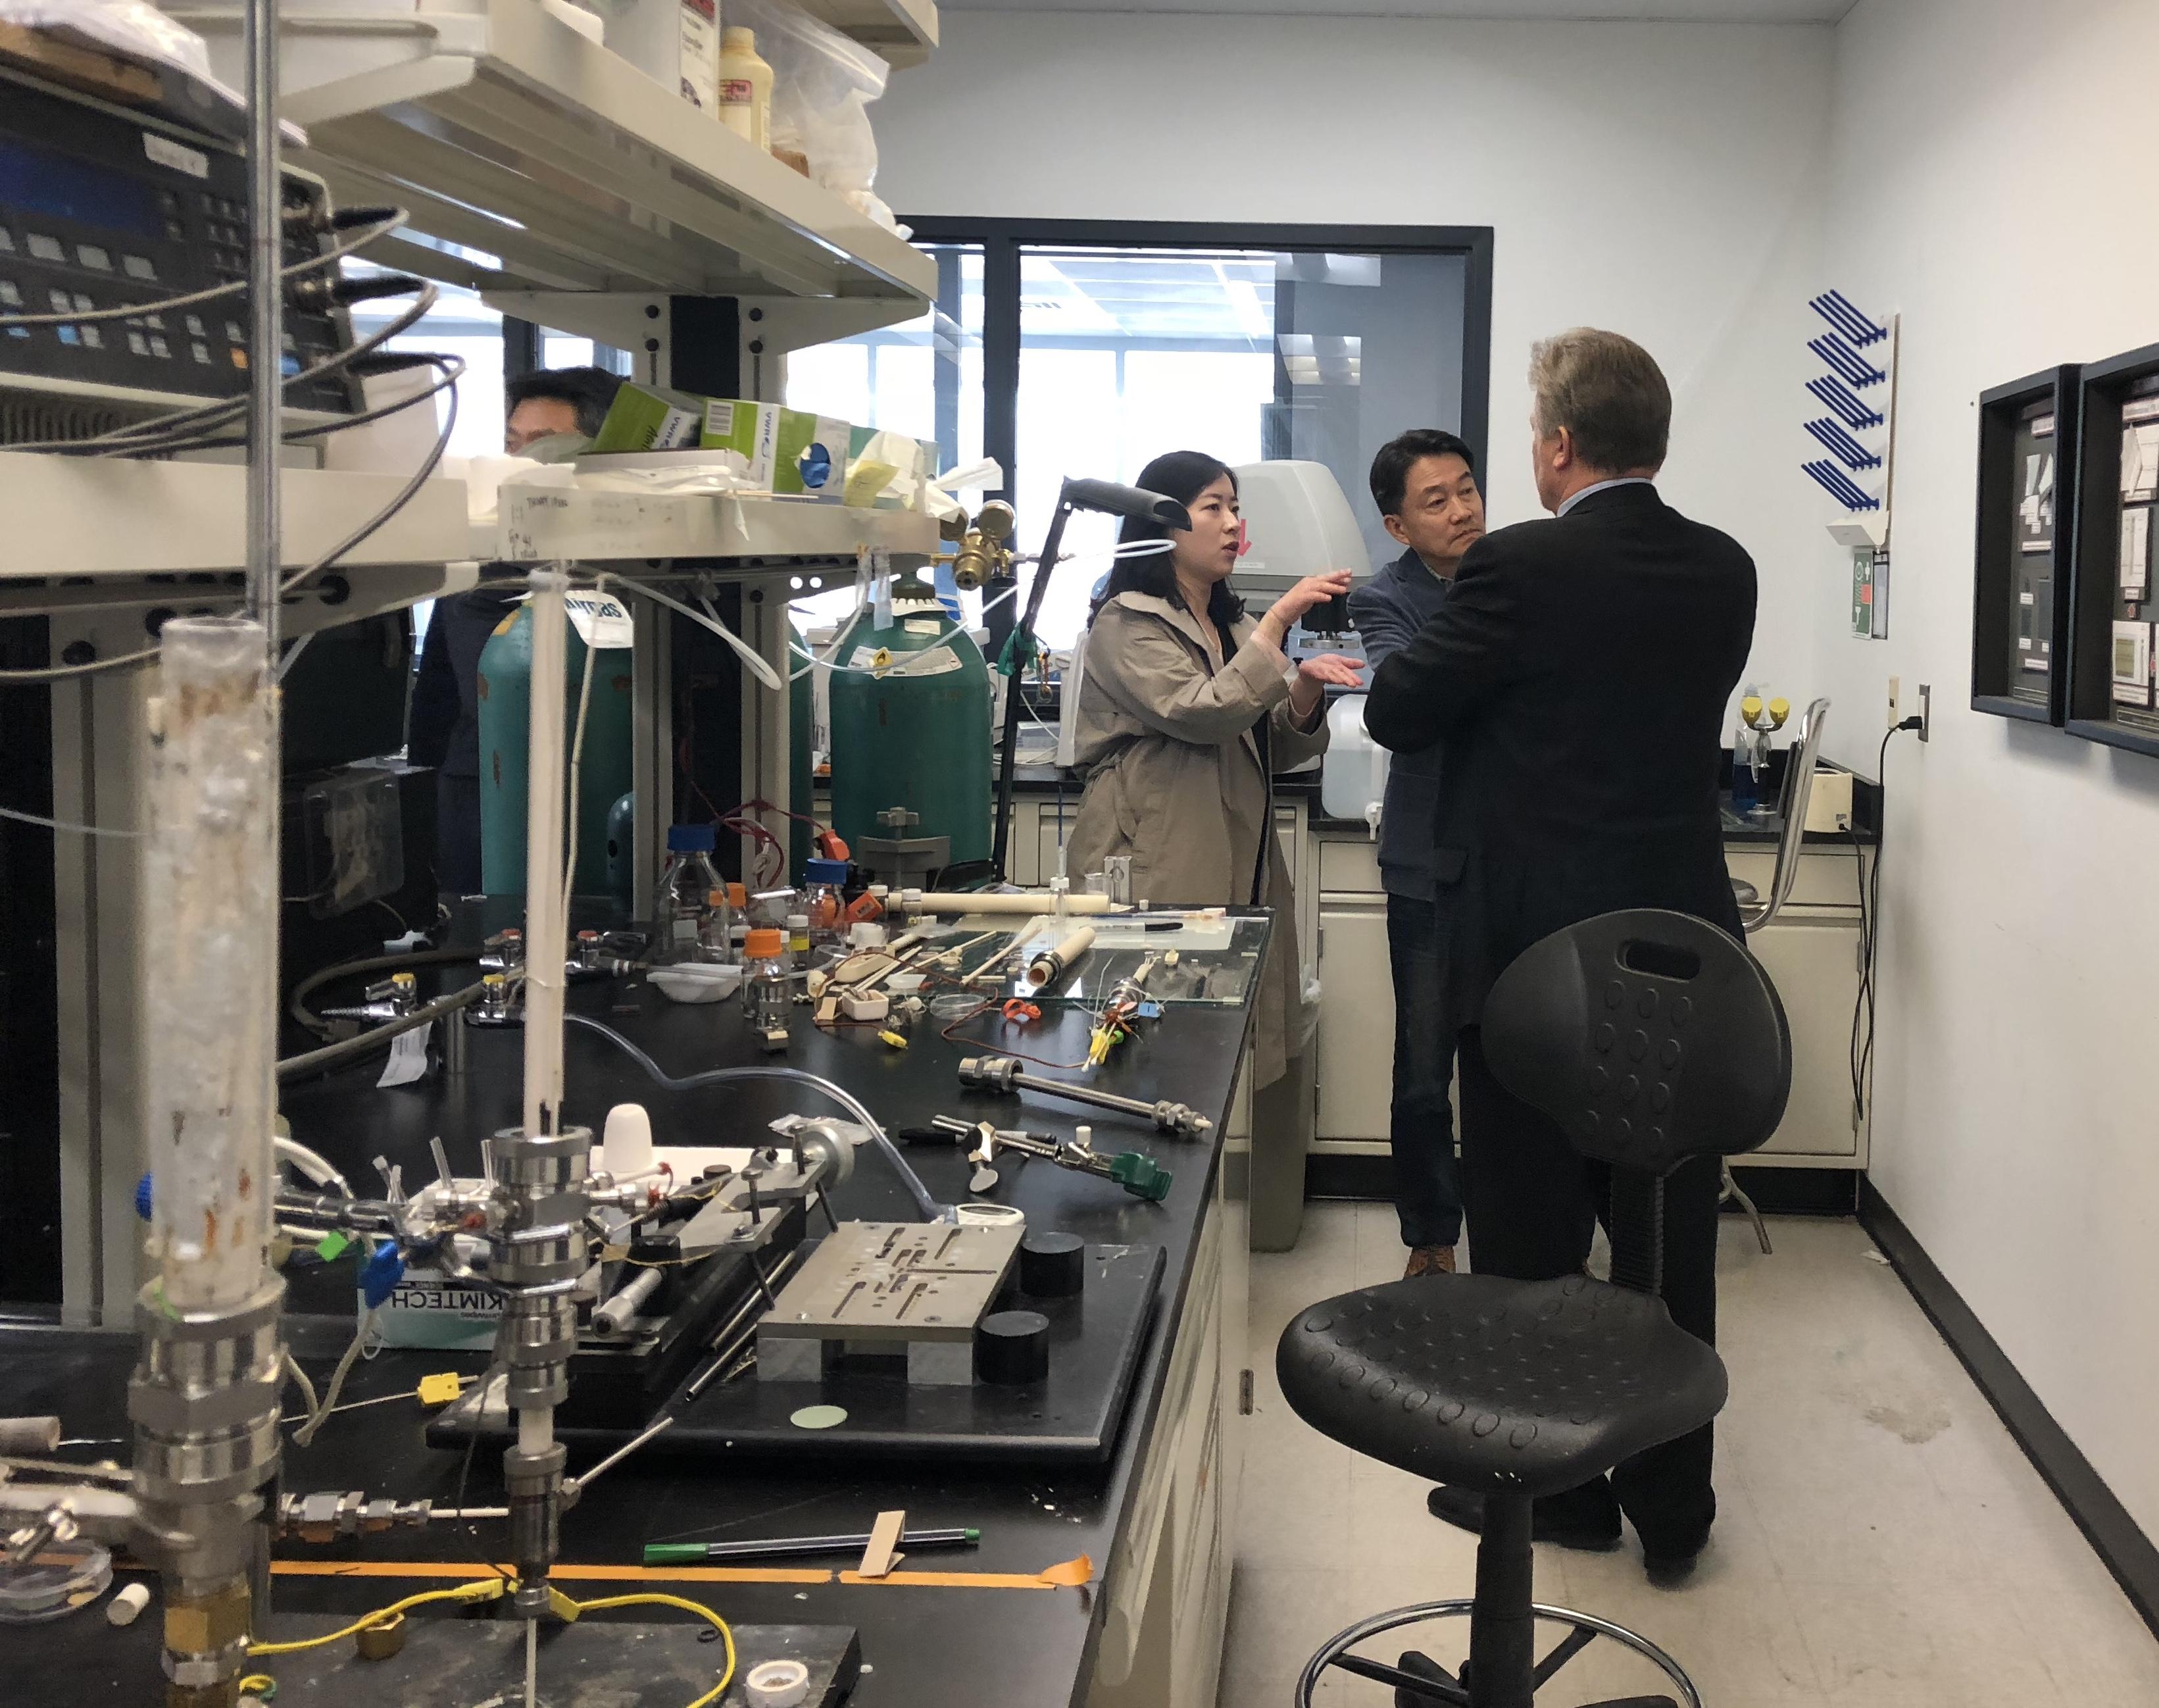 Lab picture